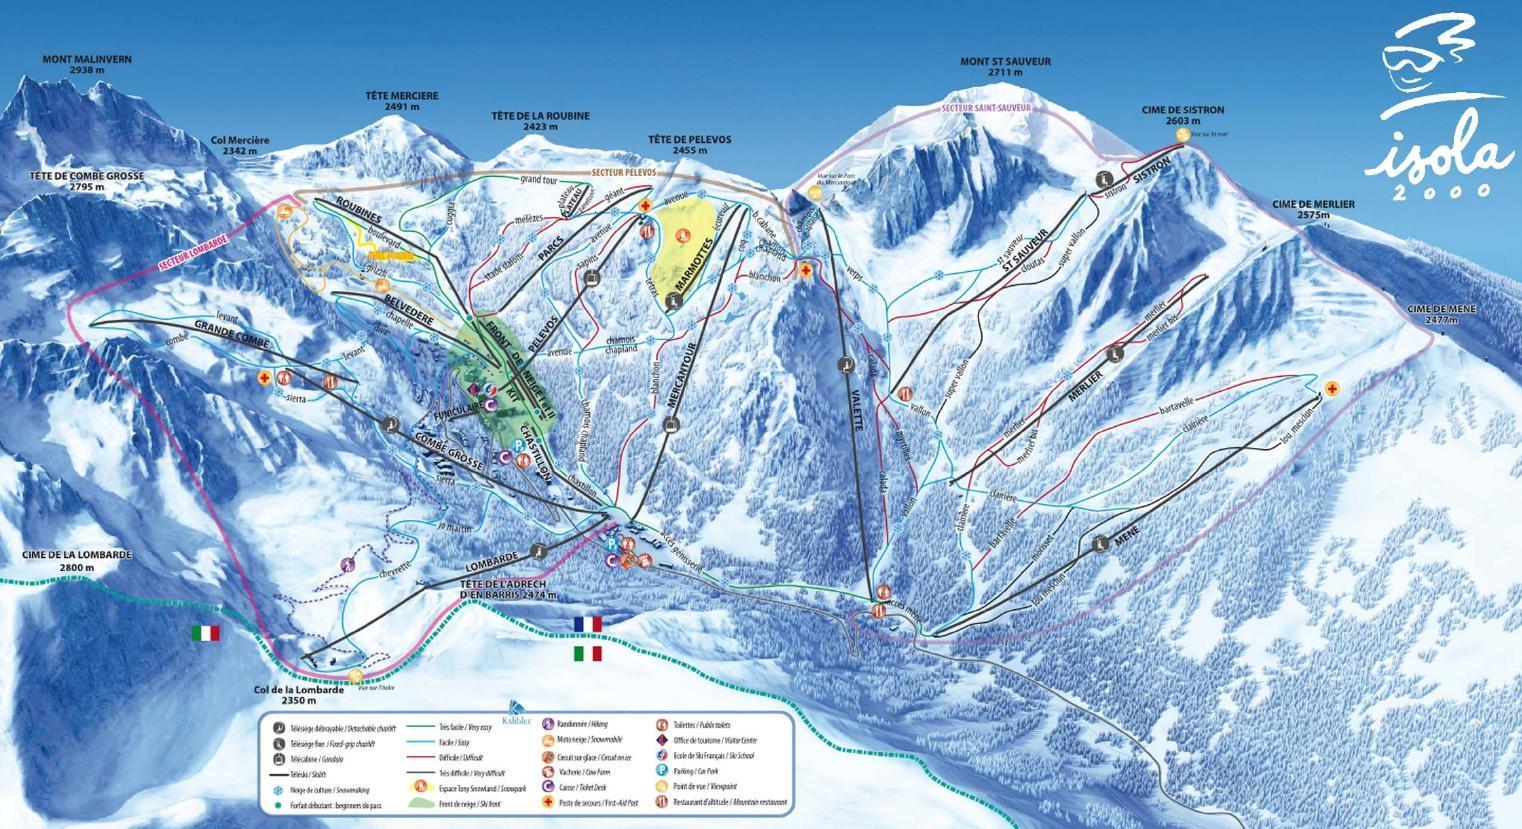 Ski map isola2000